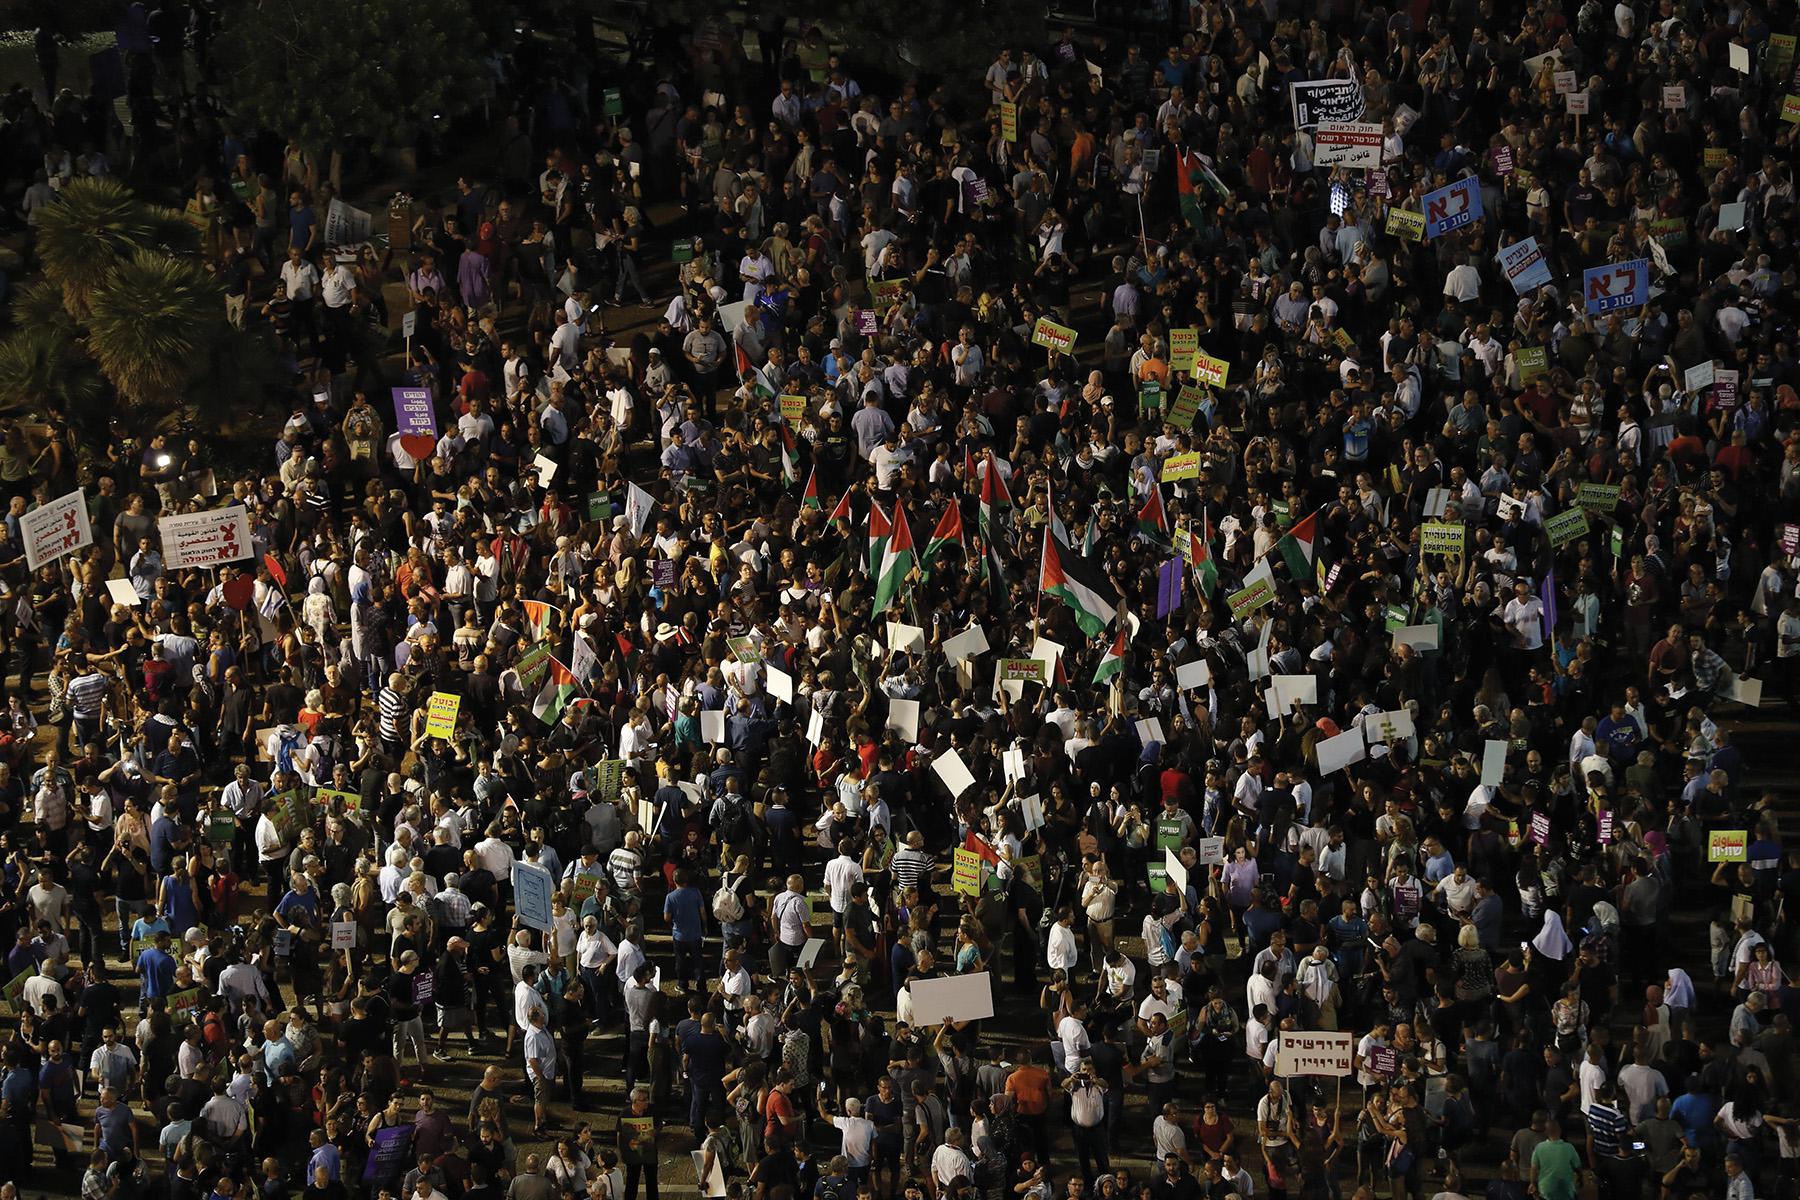 Palestinian Flags Spark New Fifth Column Cries | Jewish Week